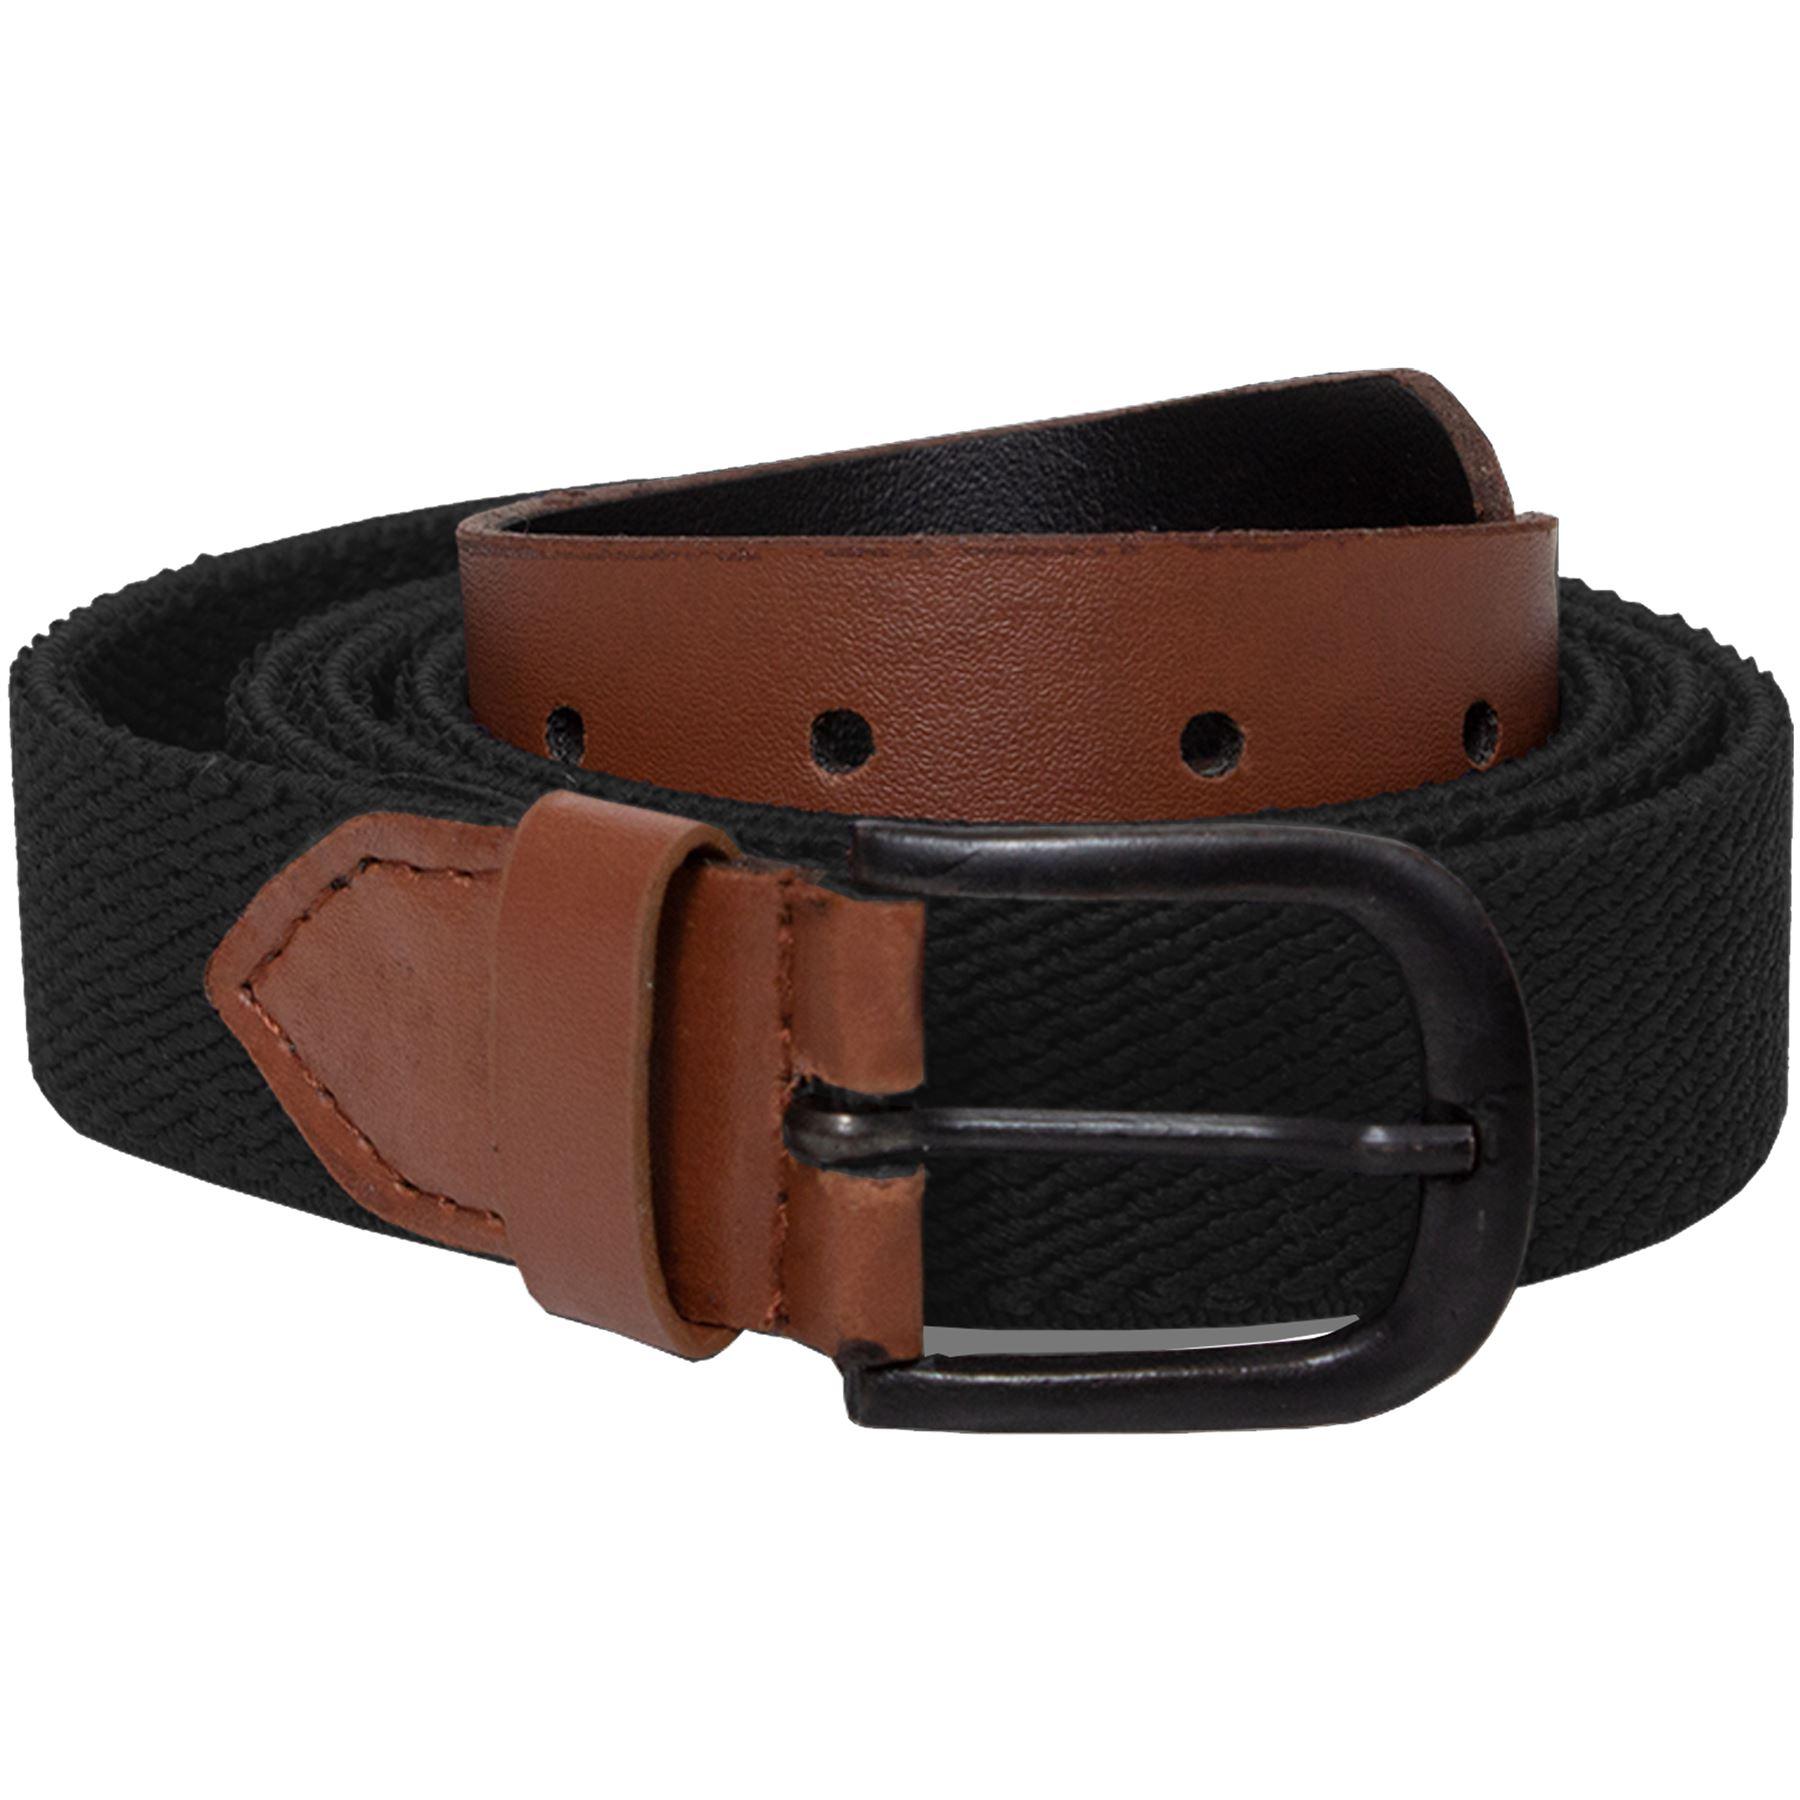 Mens-Ladies-Elasticated-Webbing-Belts-PU-Leather-Trim-Stretch-Canvas-Buckle-Belt Indexbild 10